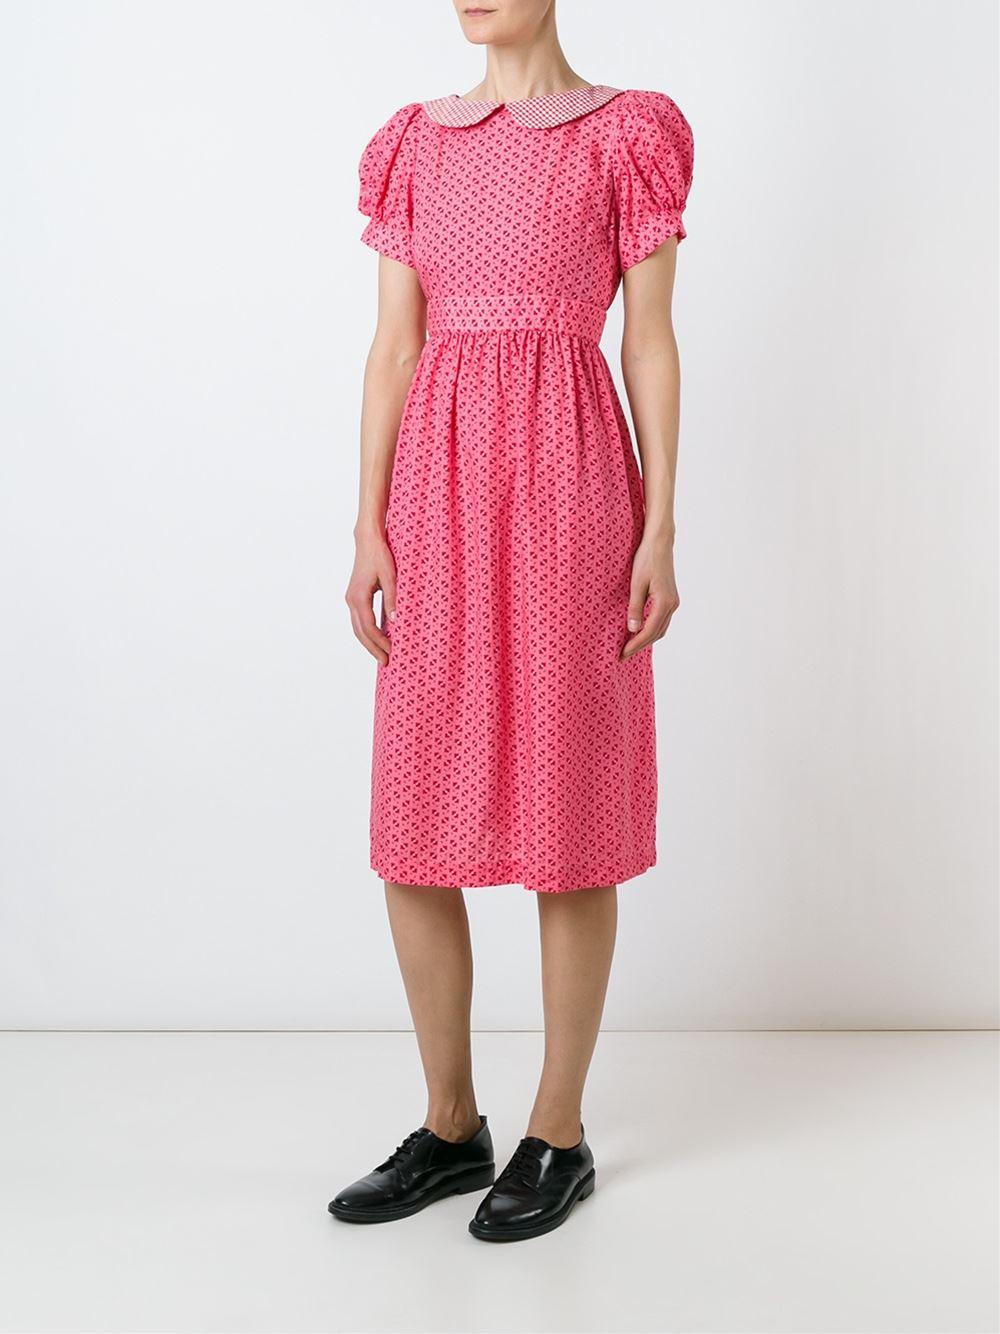 Comme Des Garcons Girl Peter Pan collar dress now $488.60